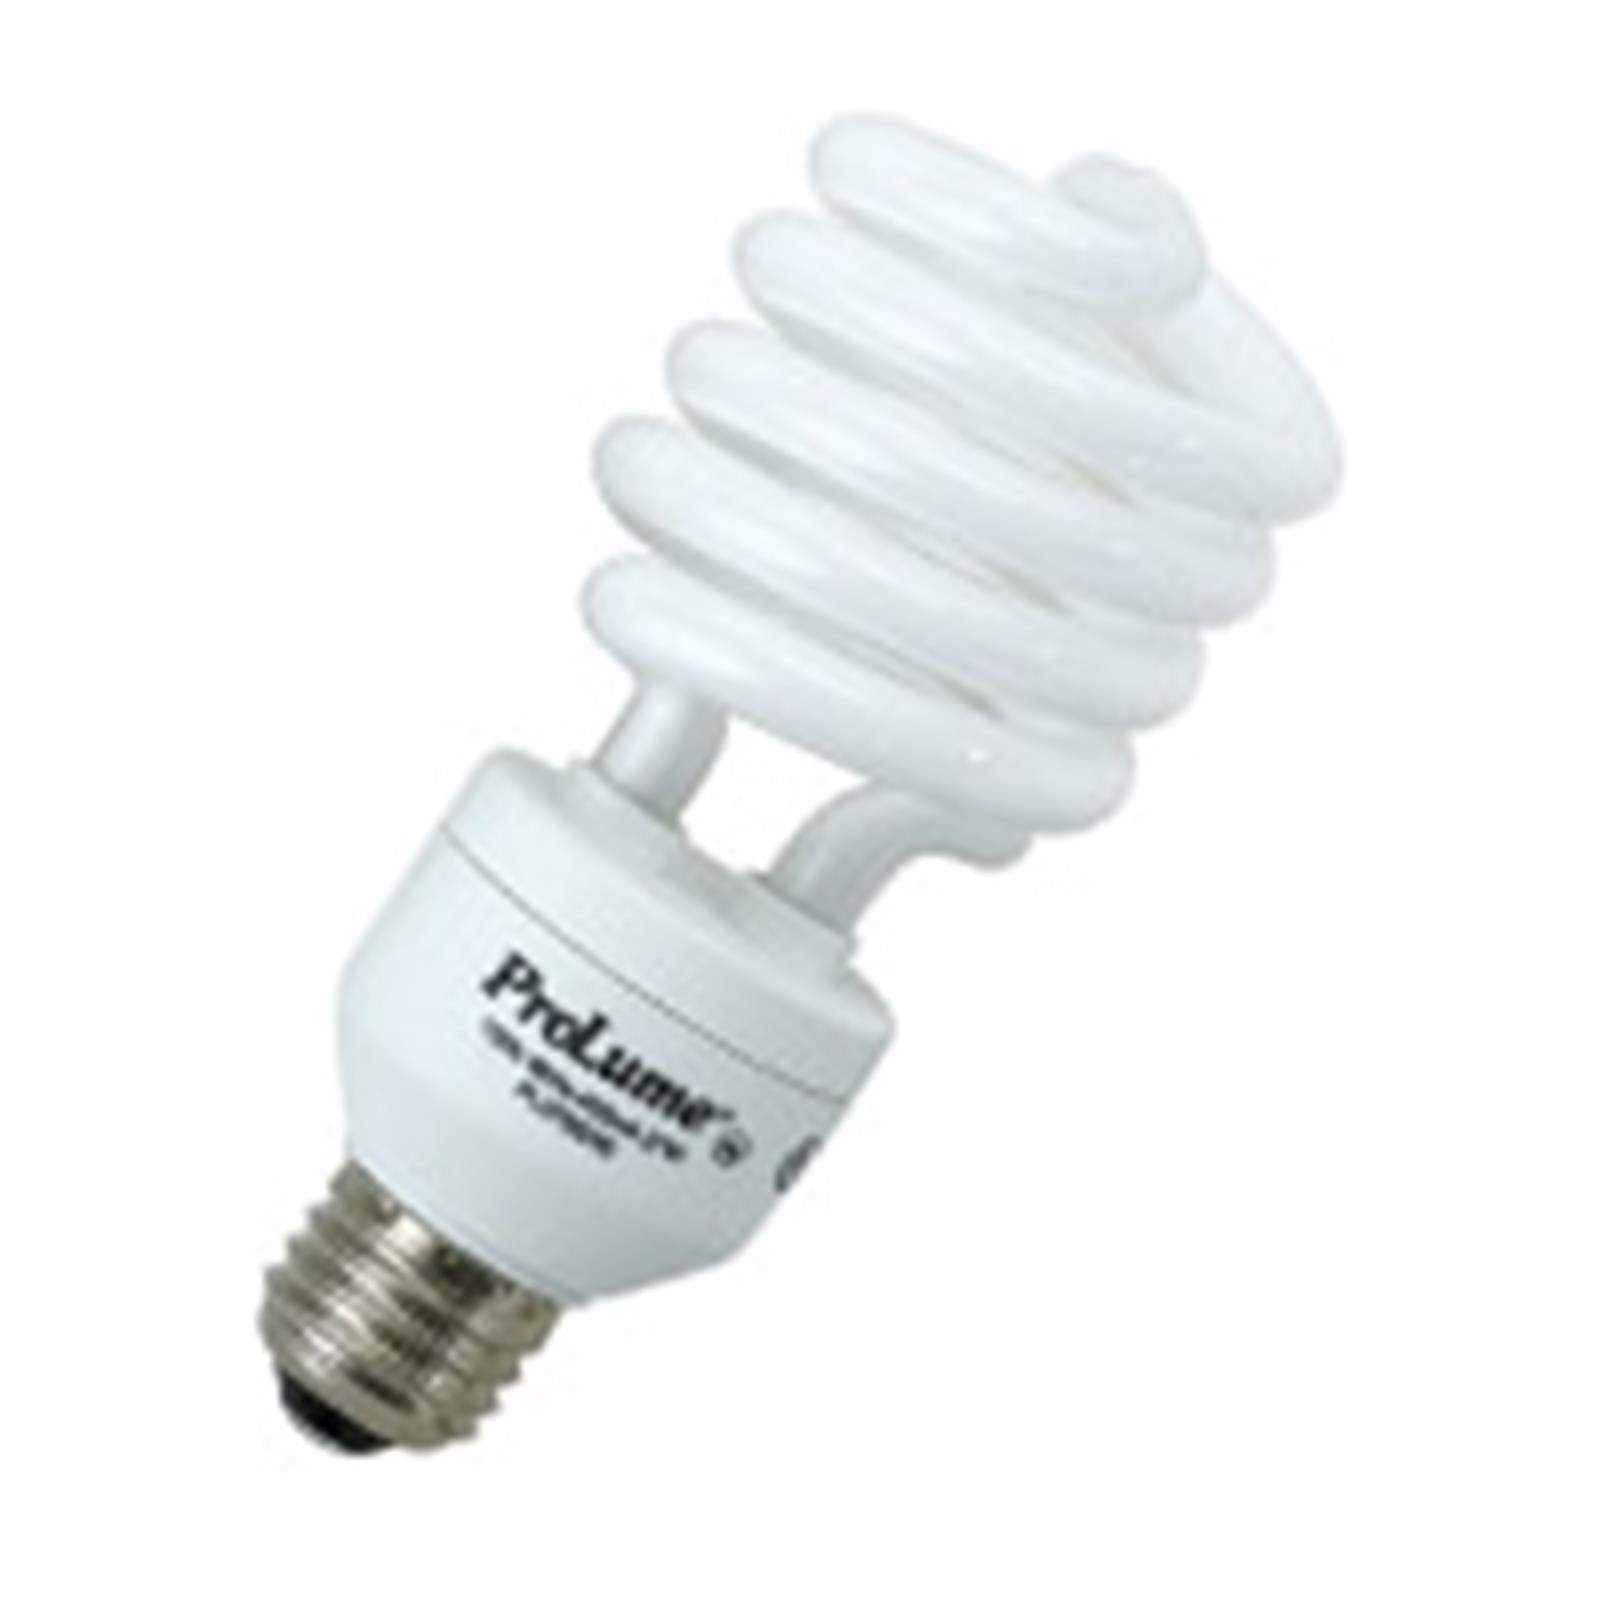 20 Qty. Halco 32W T3 Spiral 5000K Med ProLume CFL32/50 32w 120v CFL Natural White Lamp Bulb